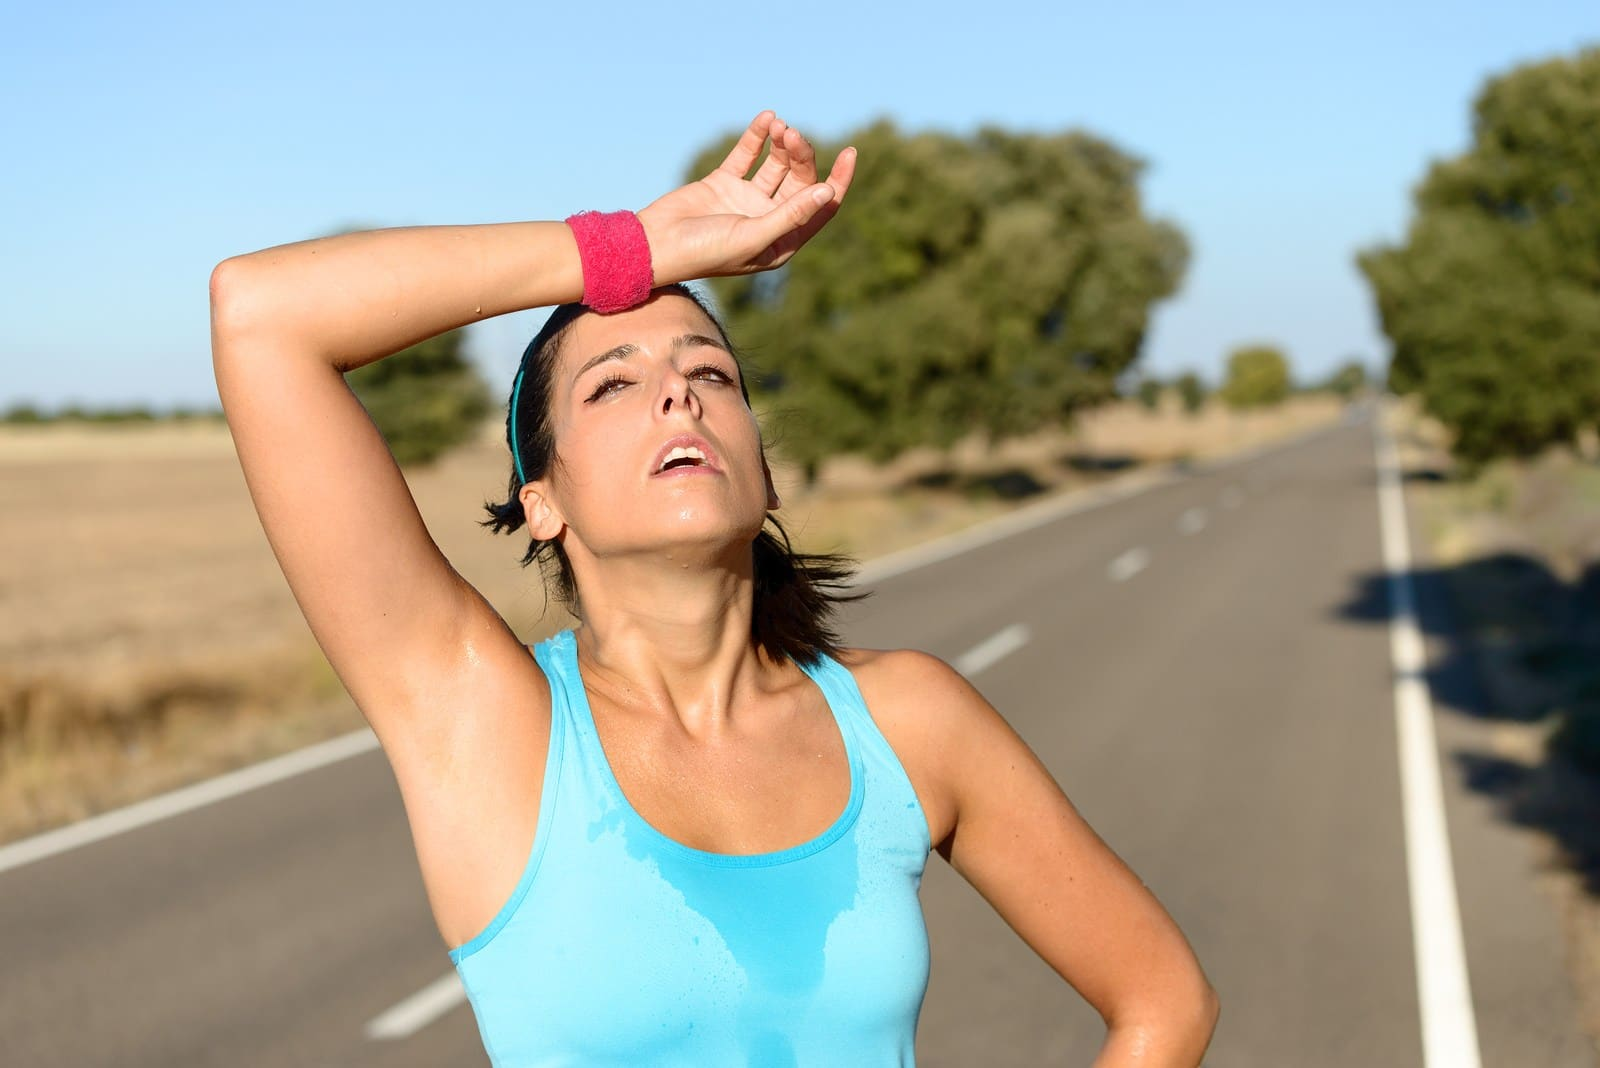 Exercise Bulimia: Bahaya Ketagih Bersenam!